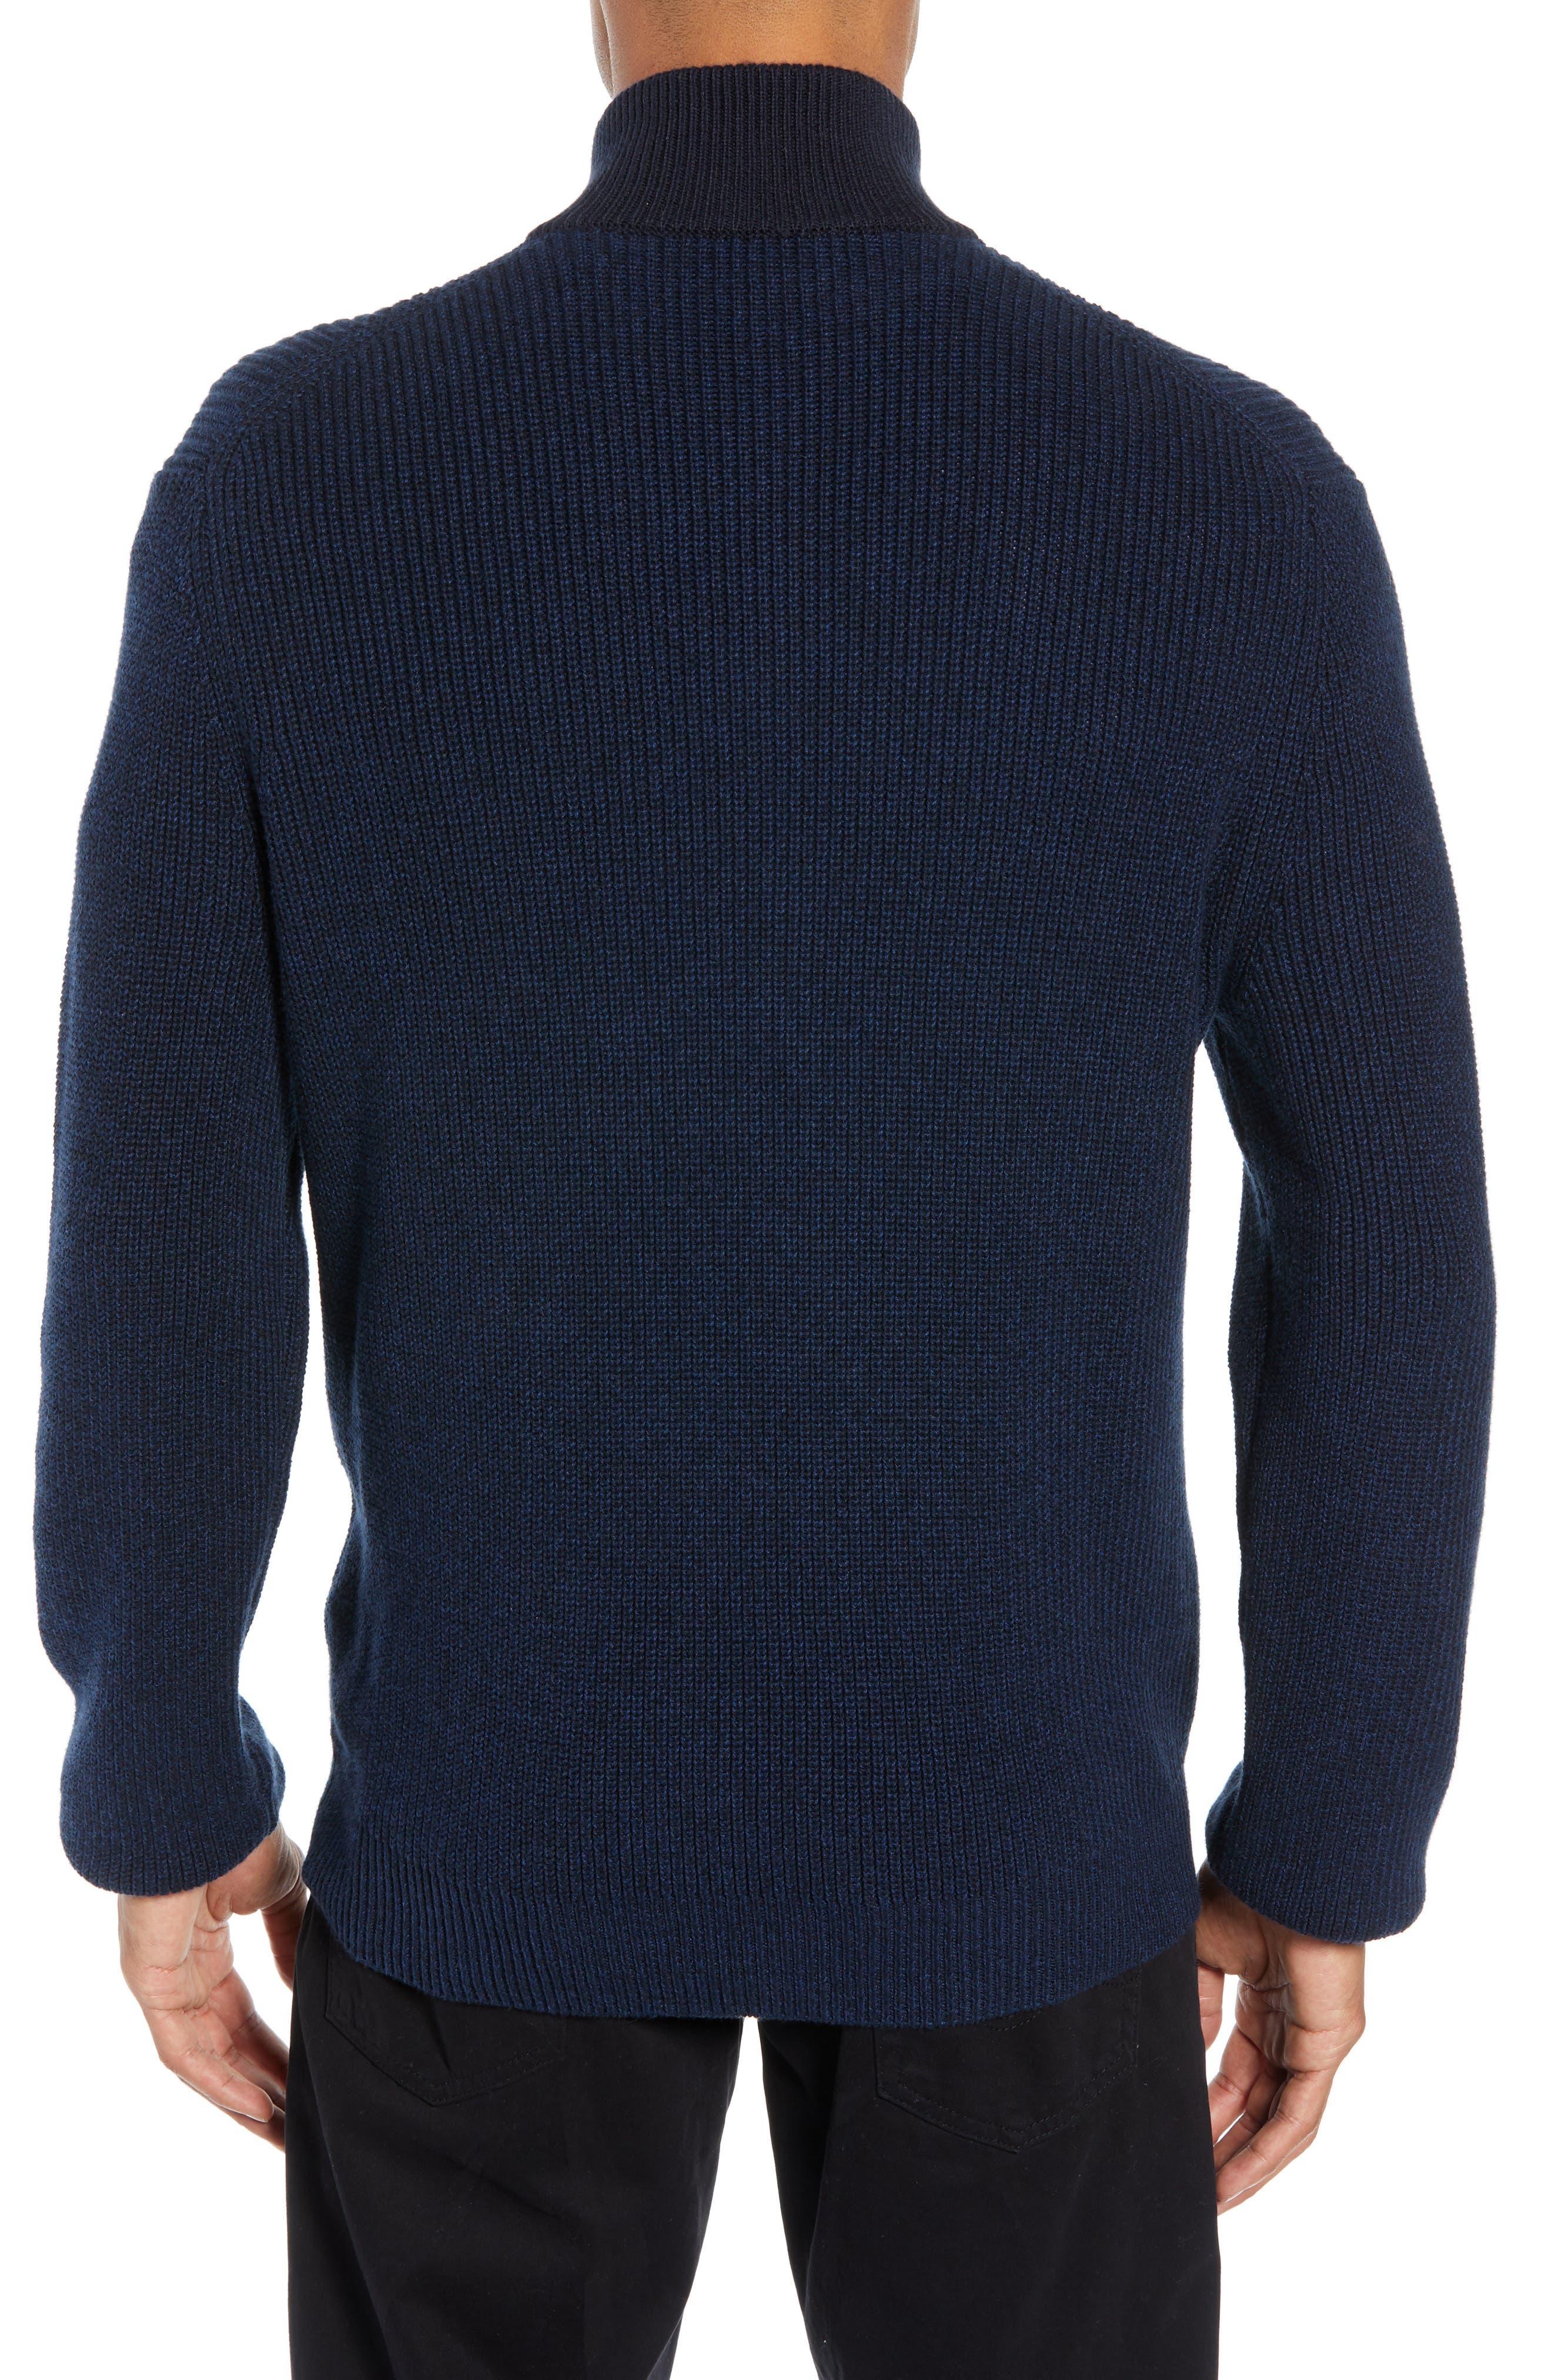 Fillmore Quarter Zip Sweater,                             Alternate thumbnail 2, color,                             NAVY